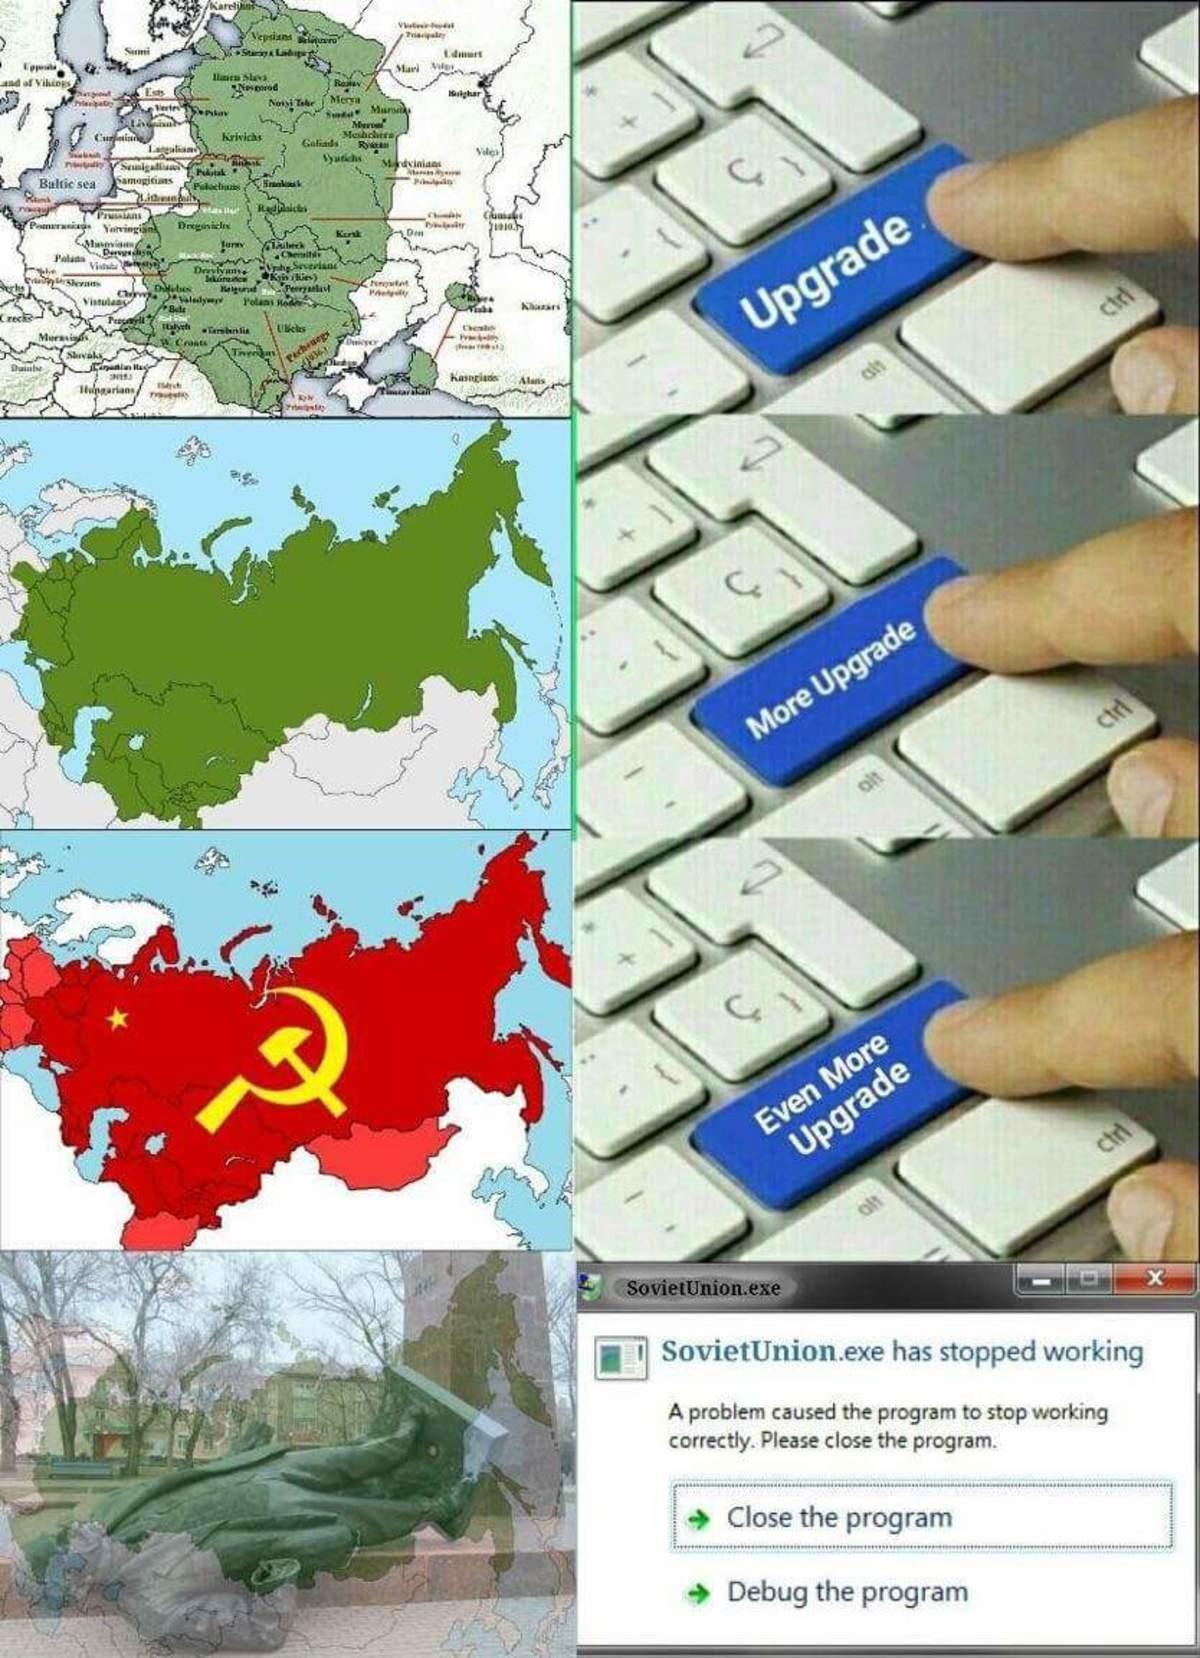 SovietUnion.exe. .. Looks like his computer is stalin' SovietUnion exe Looks like his computer is stalin'